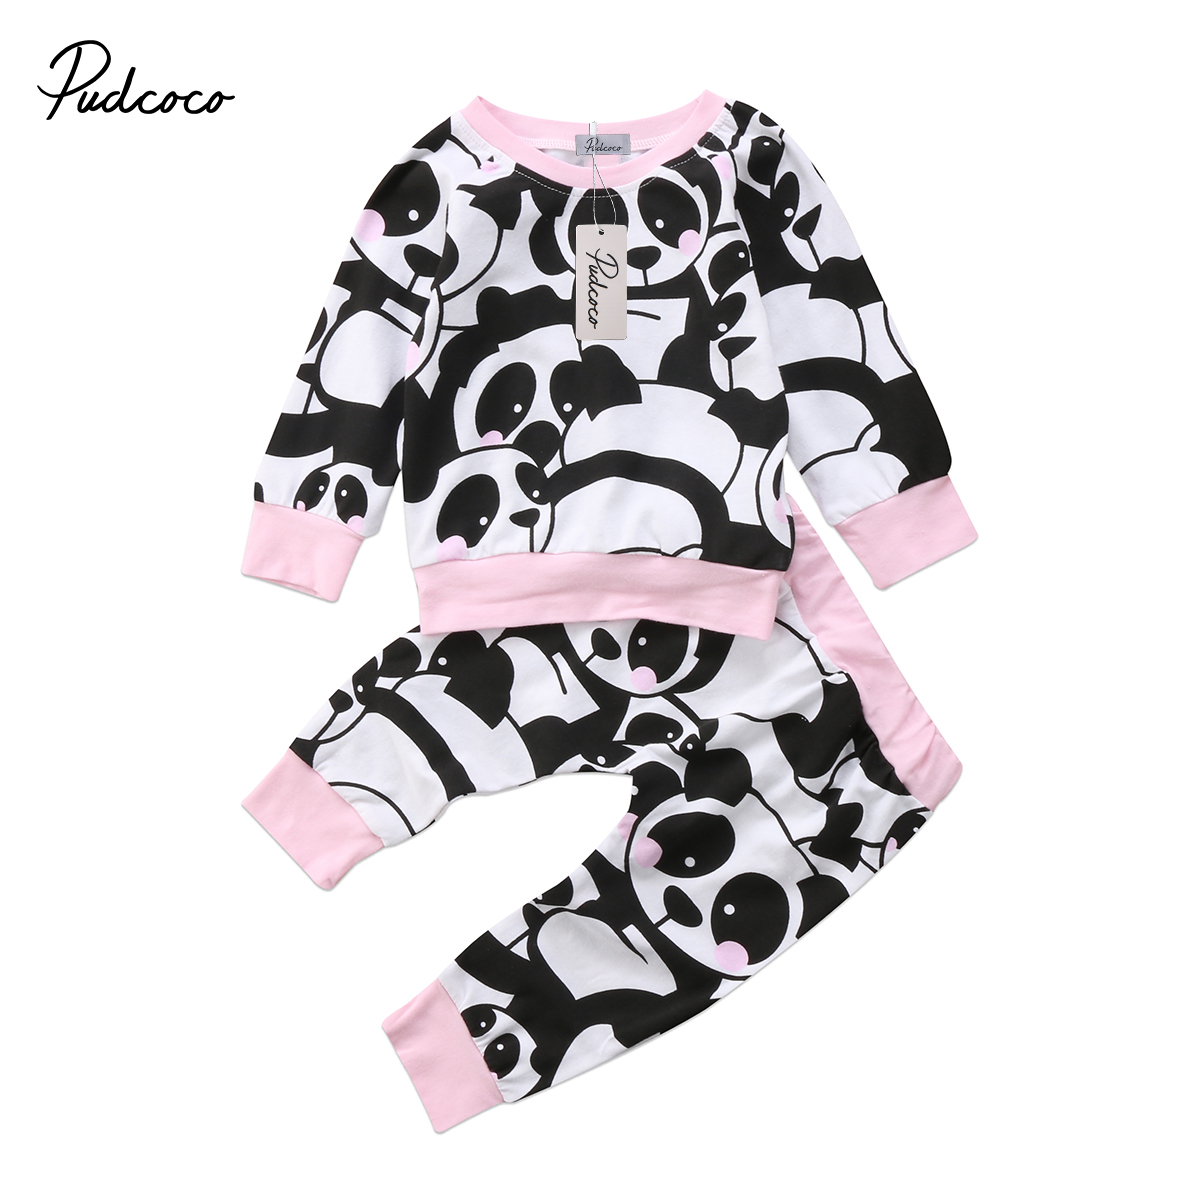 2pcs Newborn Baby Outfits Toddler Kids Baby Girl Panda Print T-shirt Pullovers Top Casual Legging Pants Girls Set